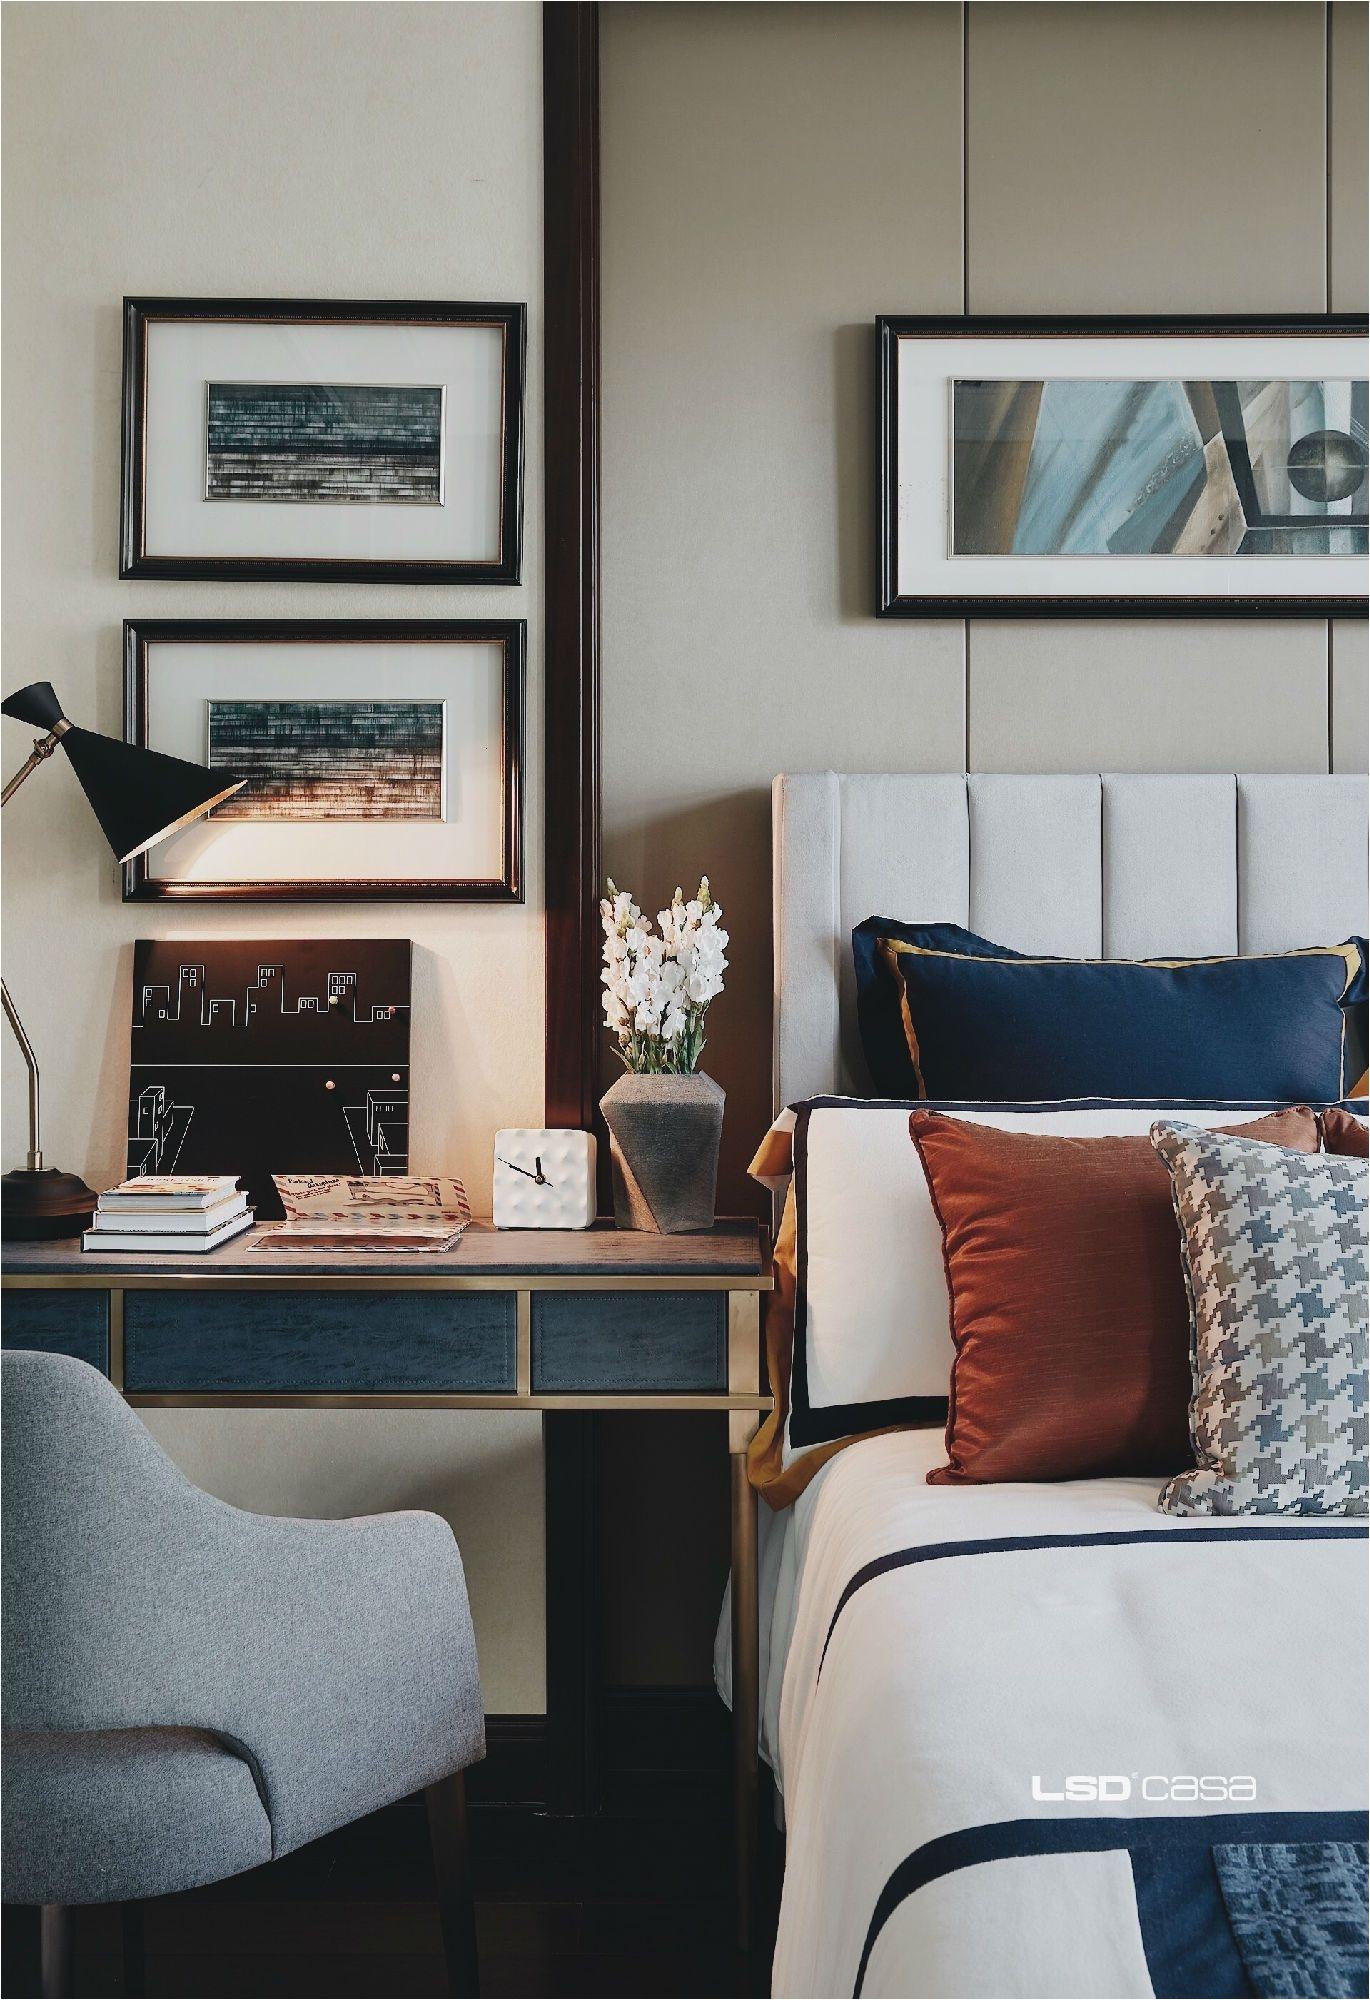 painted mid century furniture inspirational 20 beautiful vintage mid century modern bedroom design ideas photos of